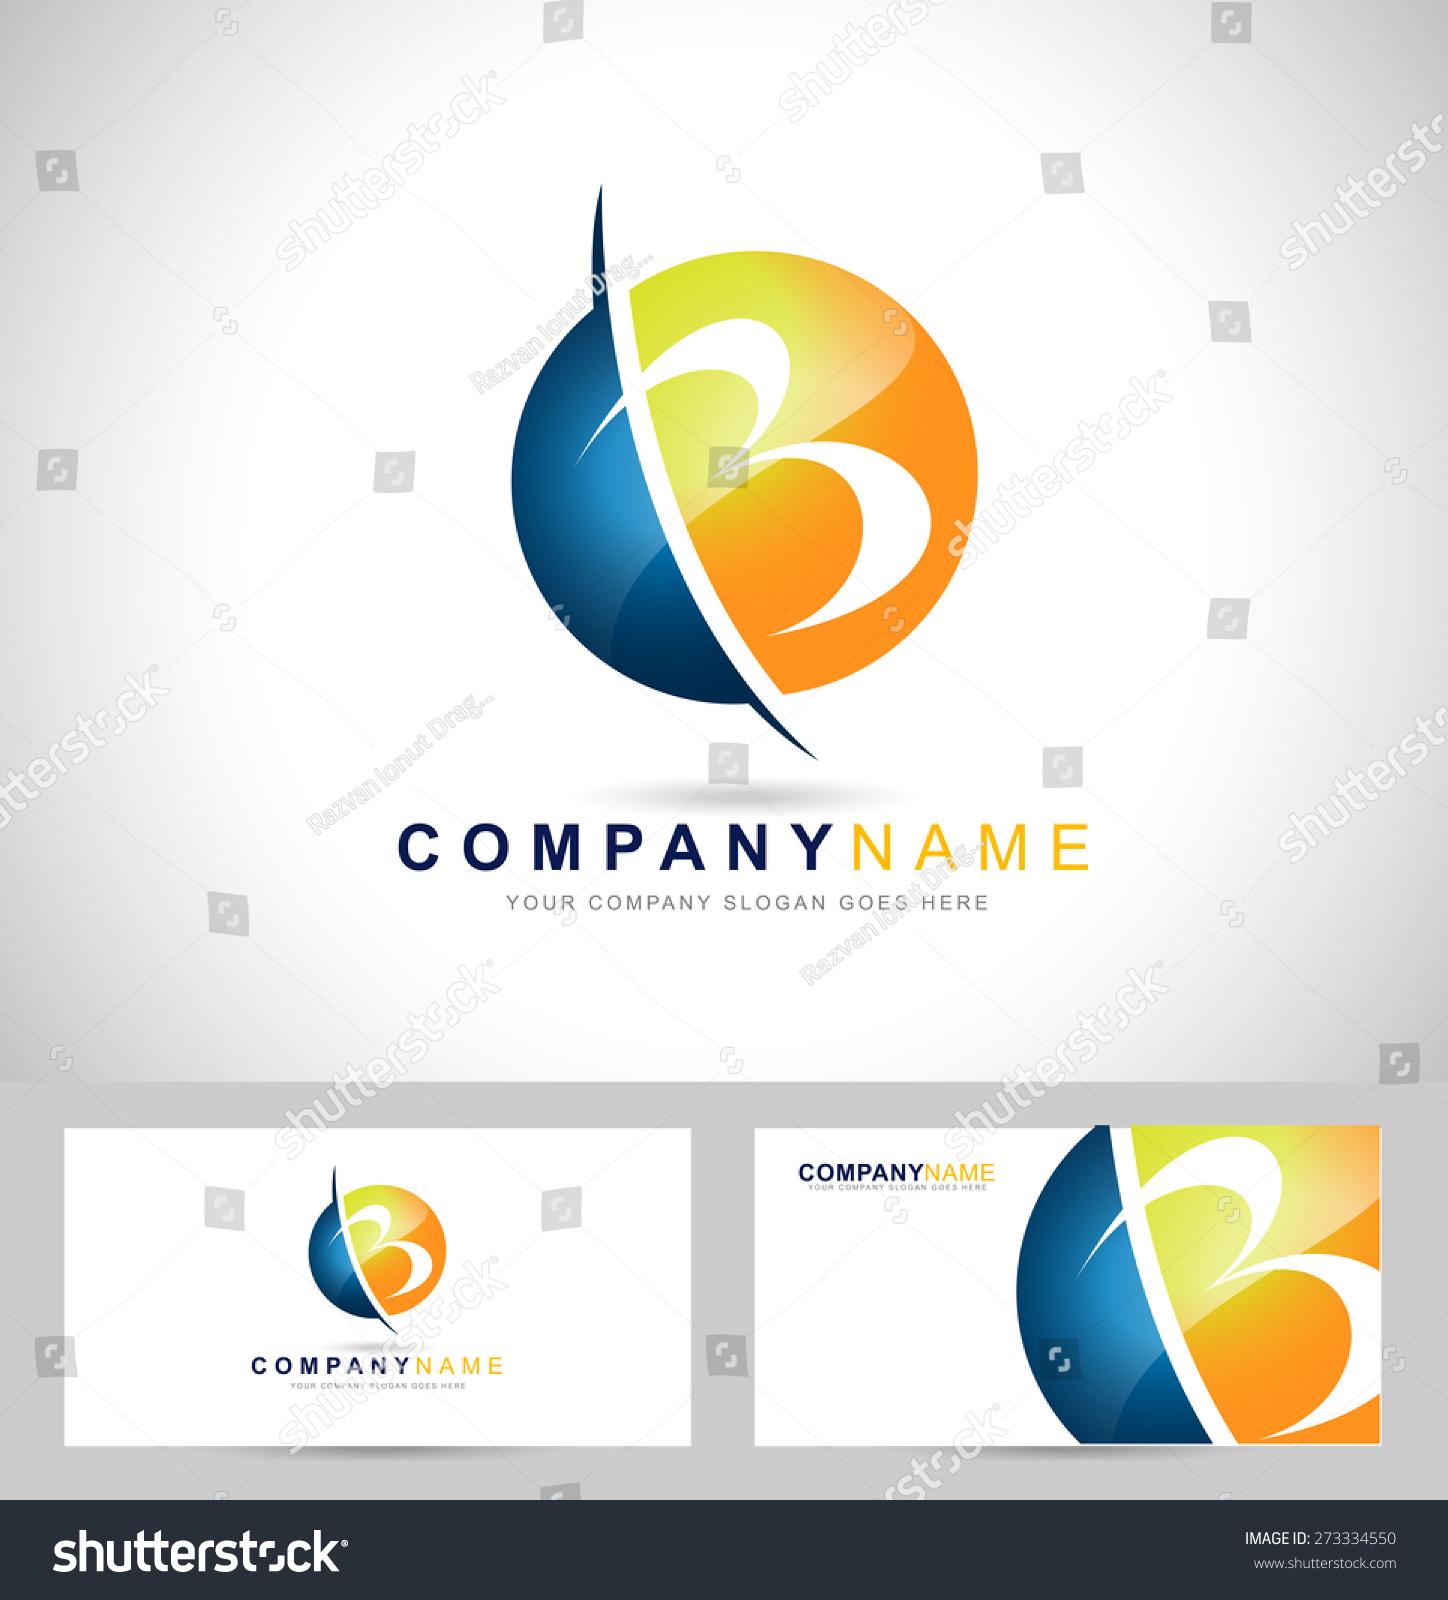 Creative Letter B Logo Design Creative Stock Vector (2018) 273334550 ...